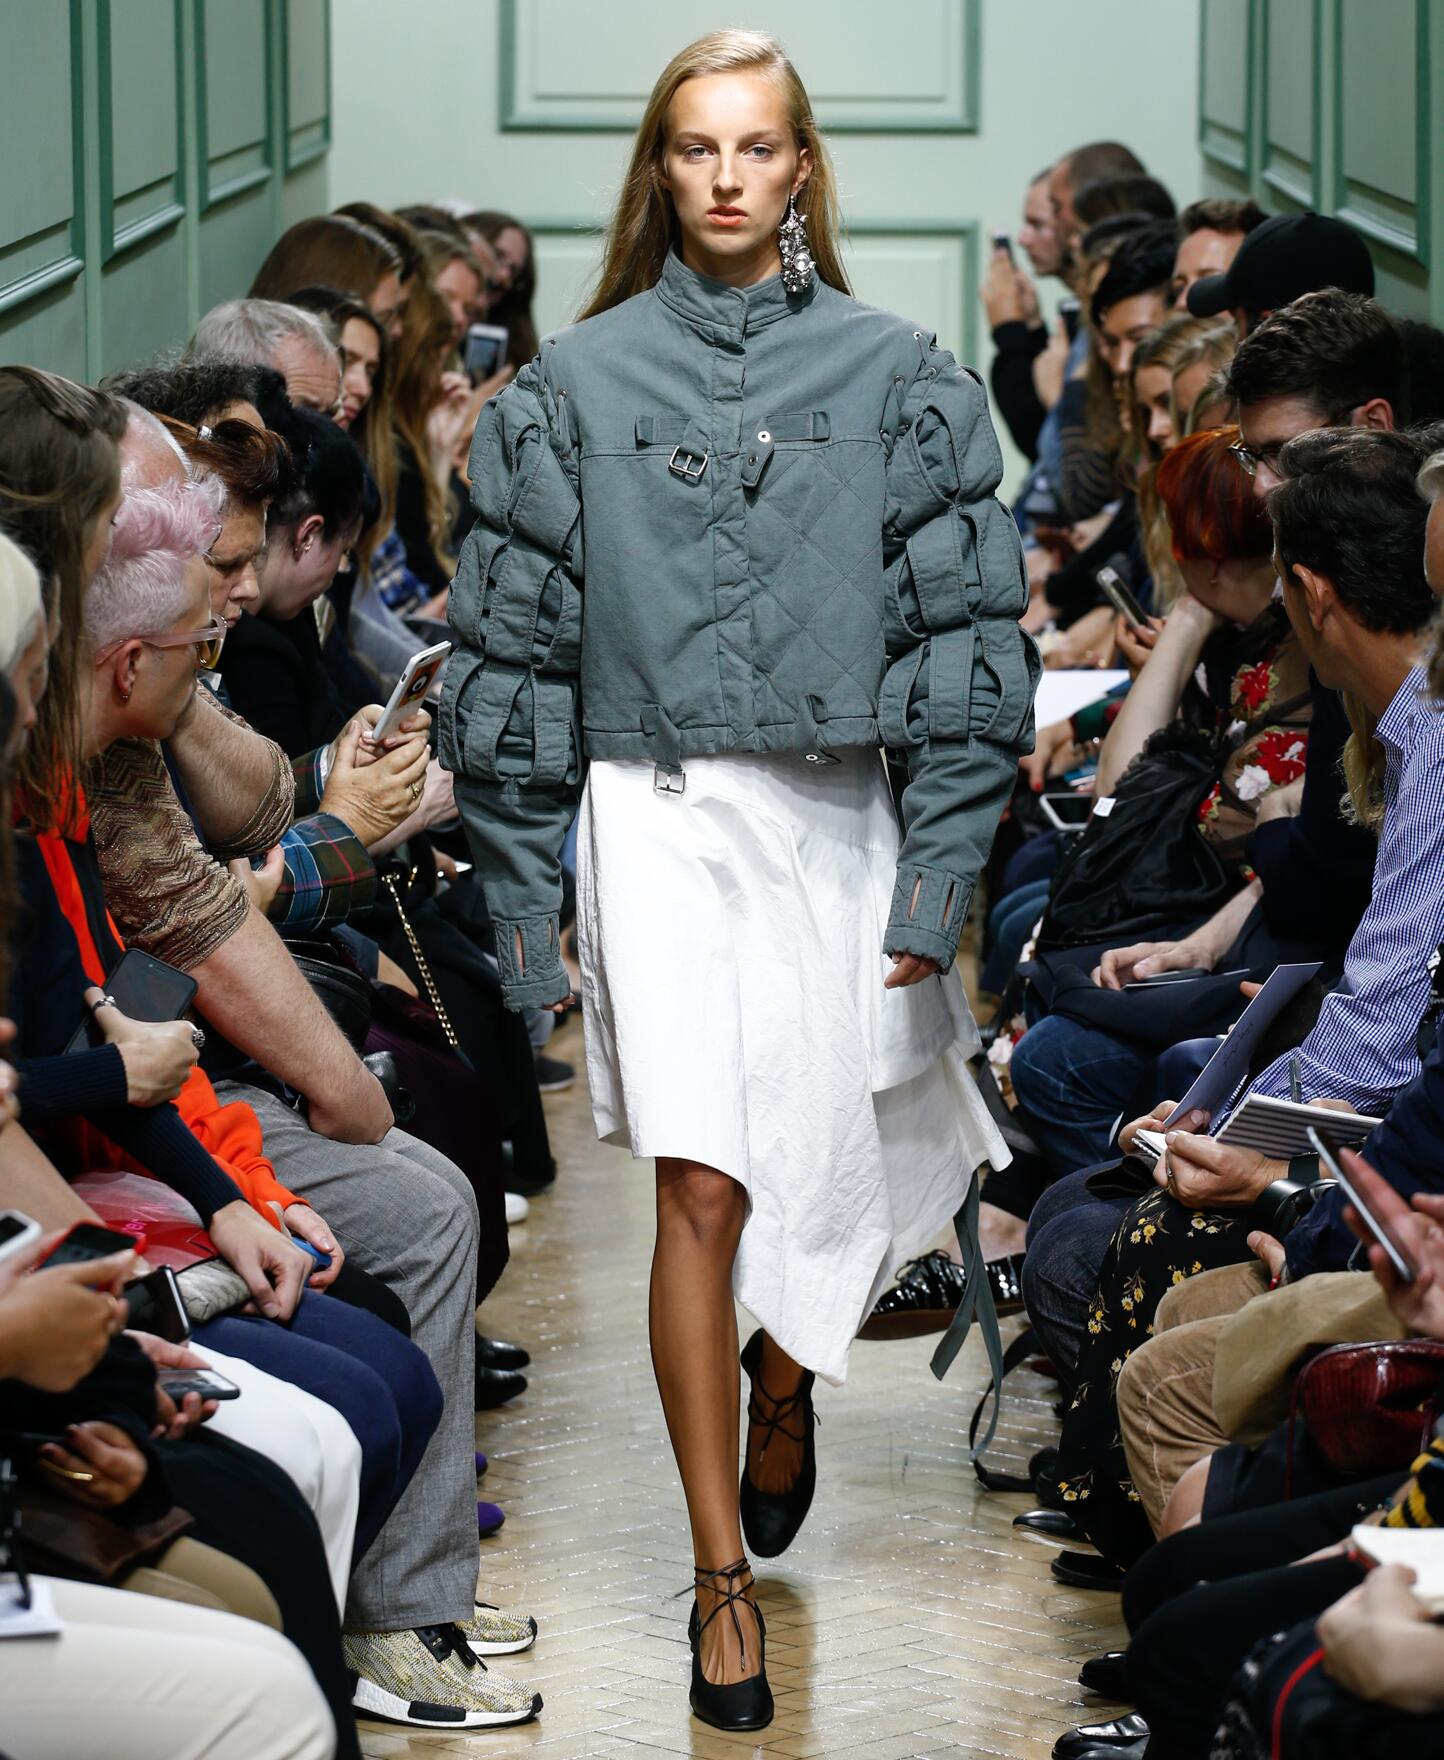 Catwalk J.W. Anderson Woman Fashion Show Summer 2017